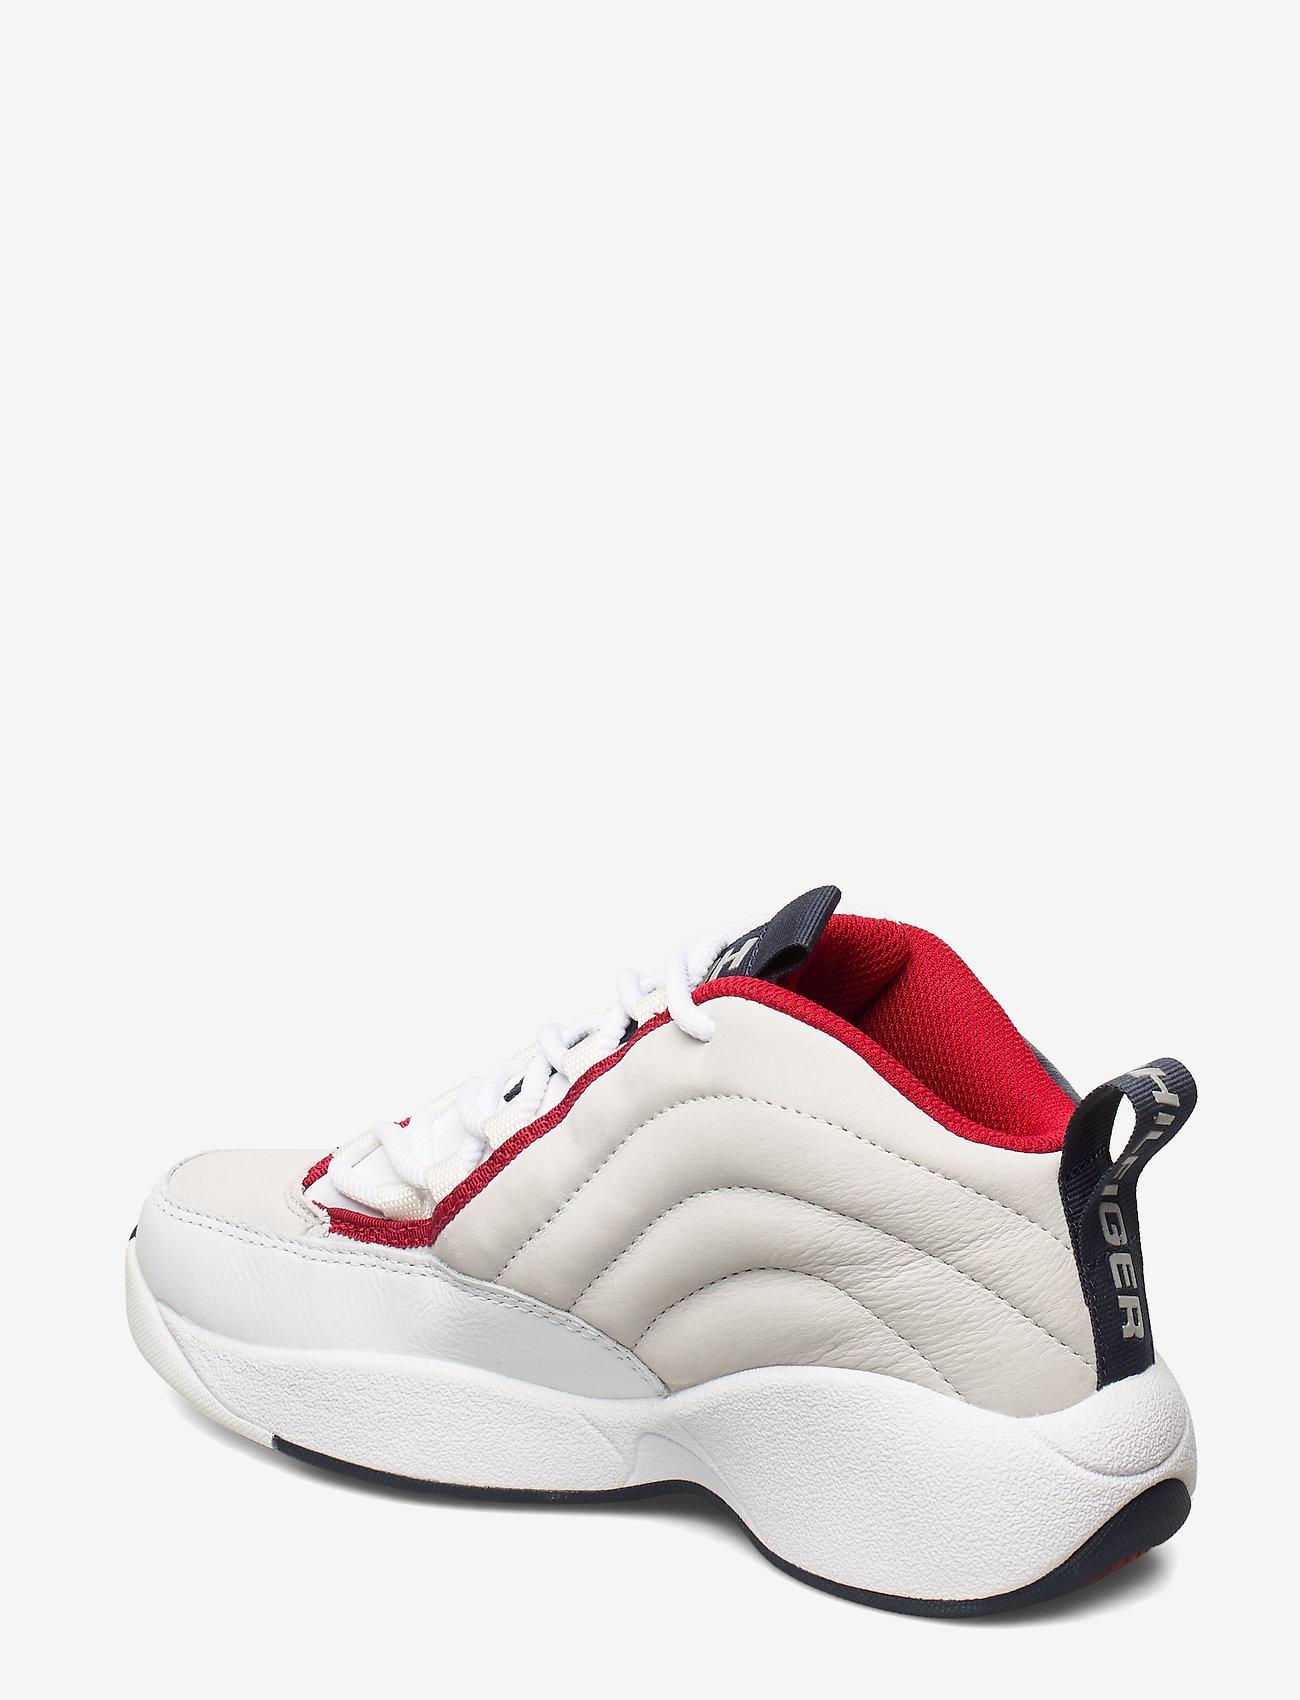 Wmns The Skew Heritage Sneaker (Rwb) - Tommy Hilfiger